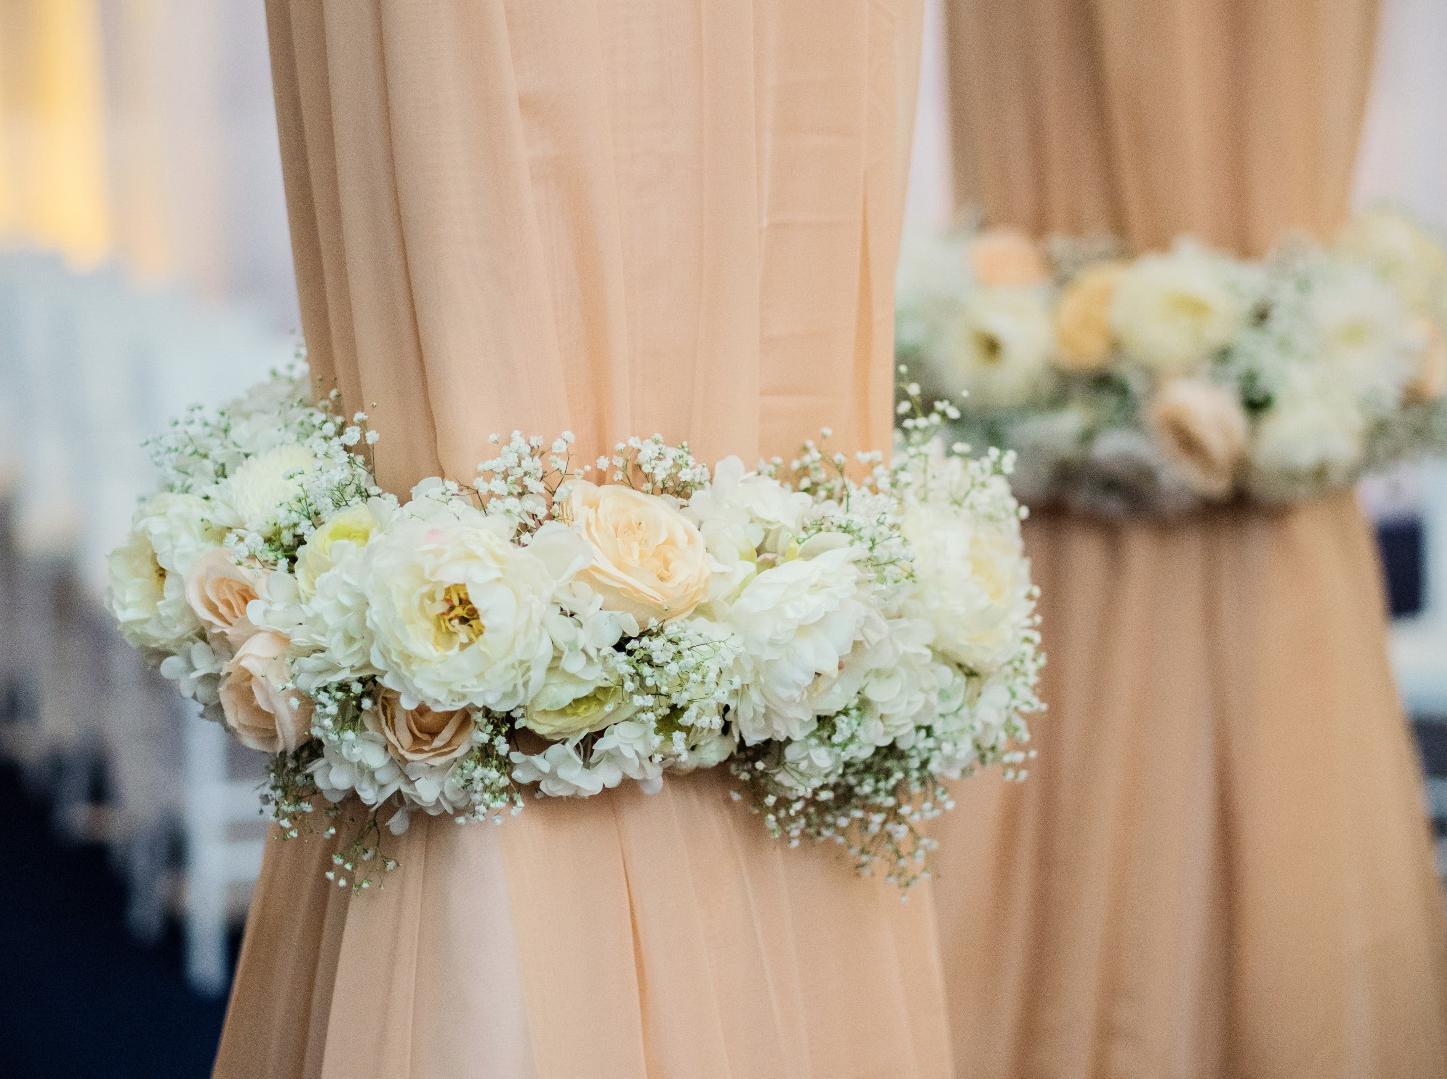 bodas-sin-clasificar-sin-tema-cuba-25492.jpg